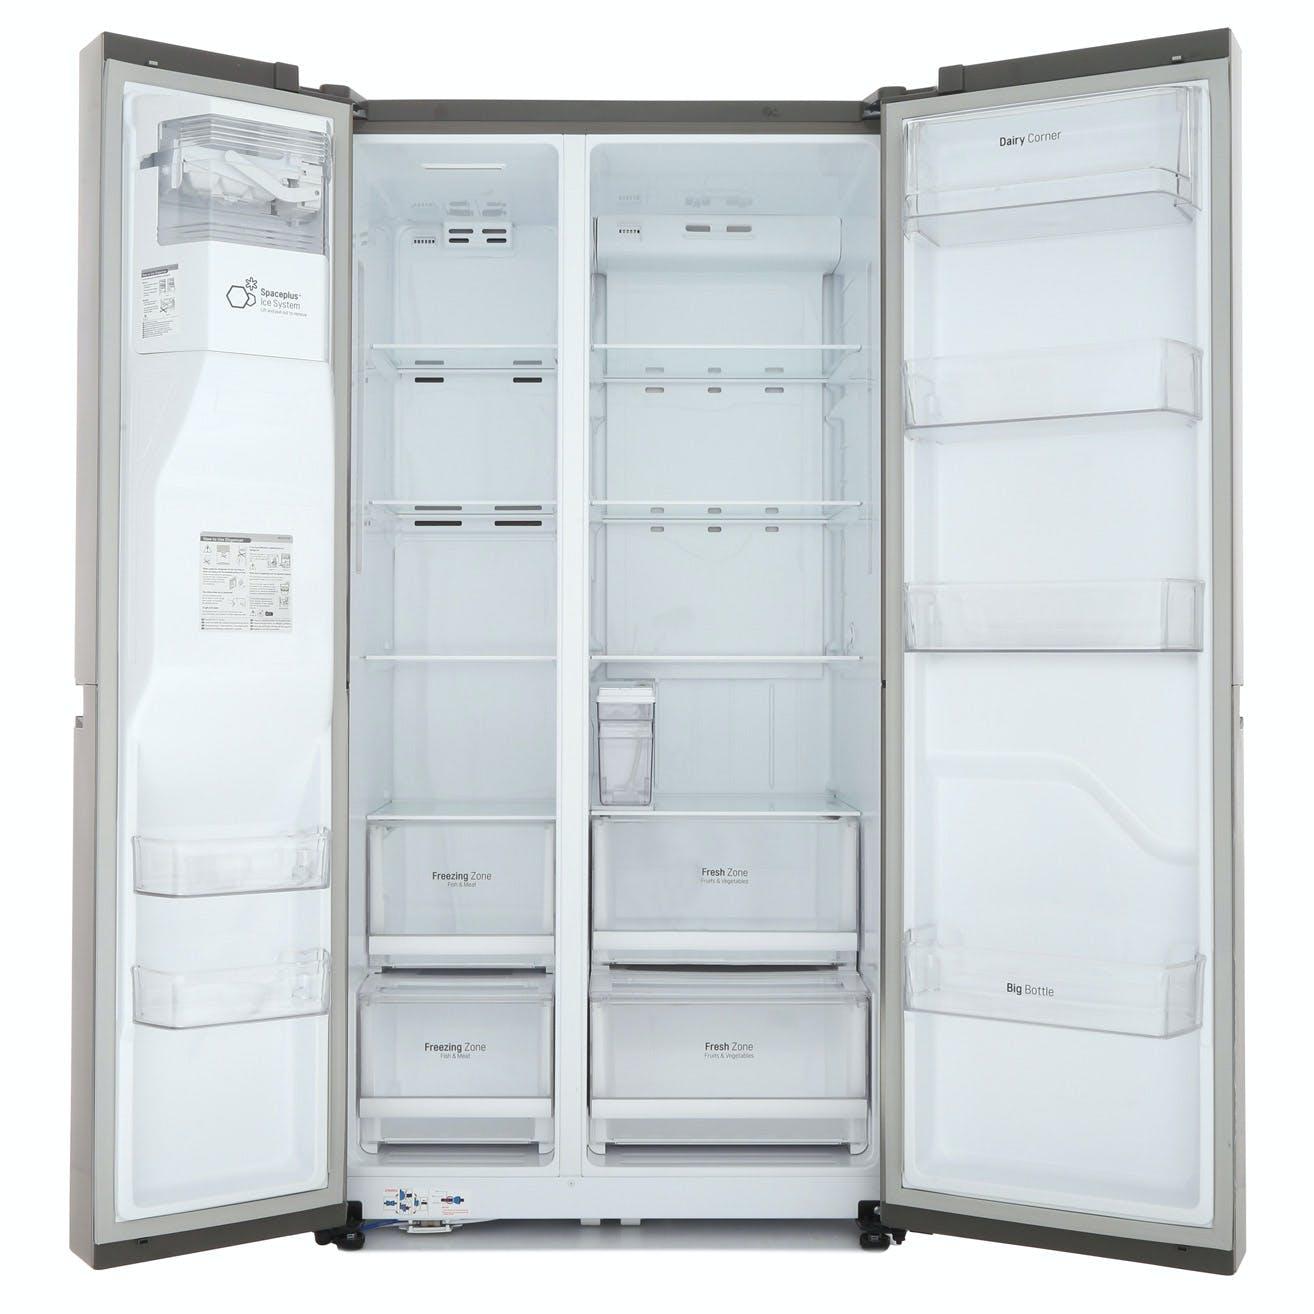 LG GSL761PZXV American Fridge Freezer in Shiny Steel, Ice/Water NP